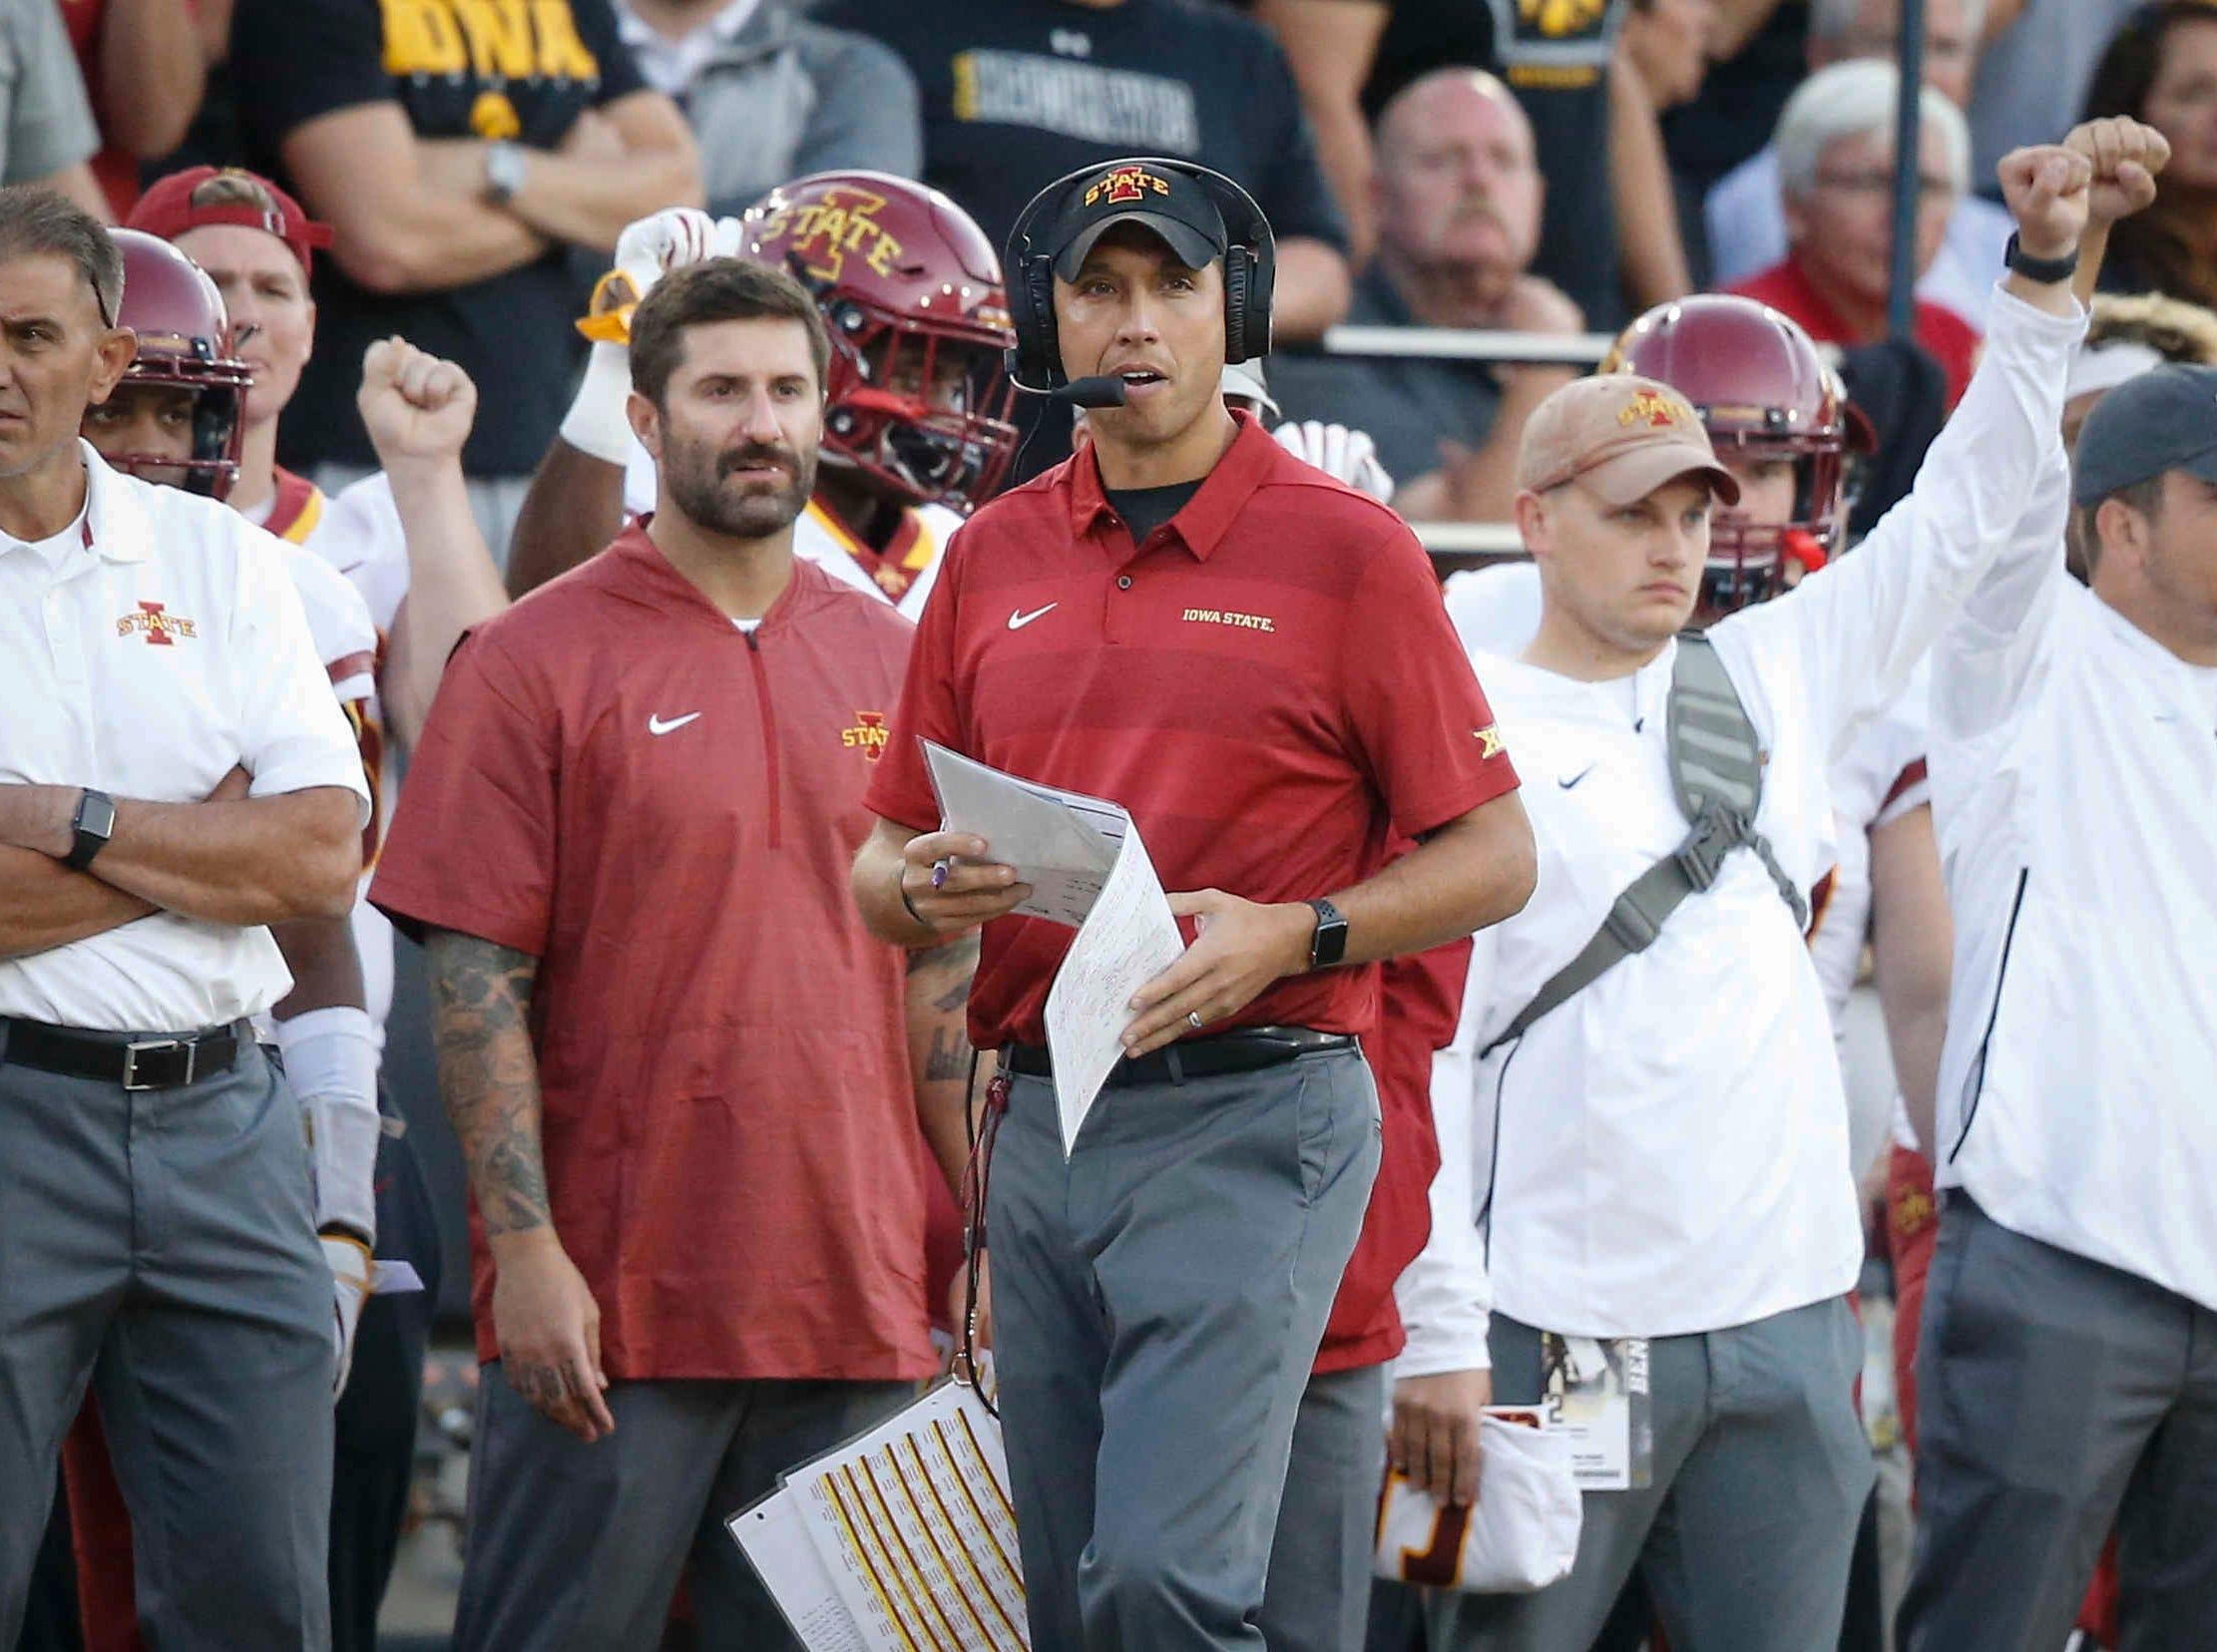 Iowa State head football coach Matt Campbell looks on after a play against Iowa on Saturday, Sept. 8, 2018, at Kinnick Stadium in Iowa City.